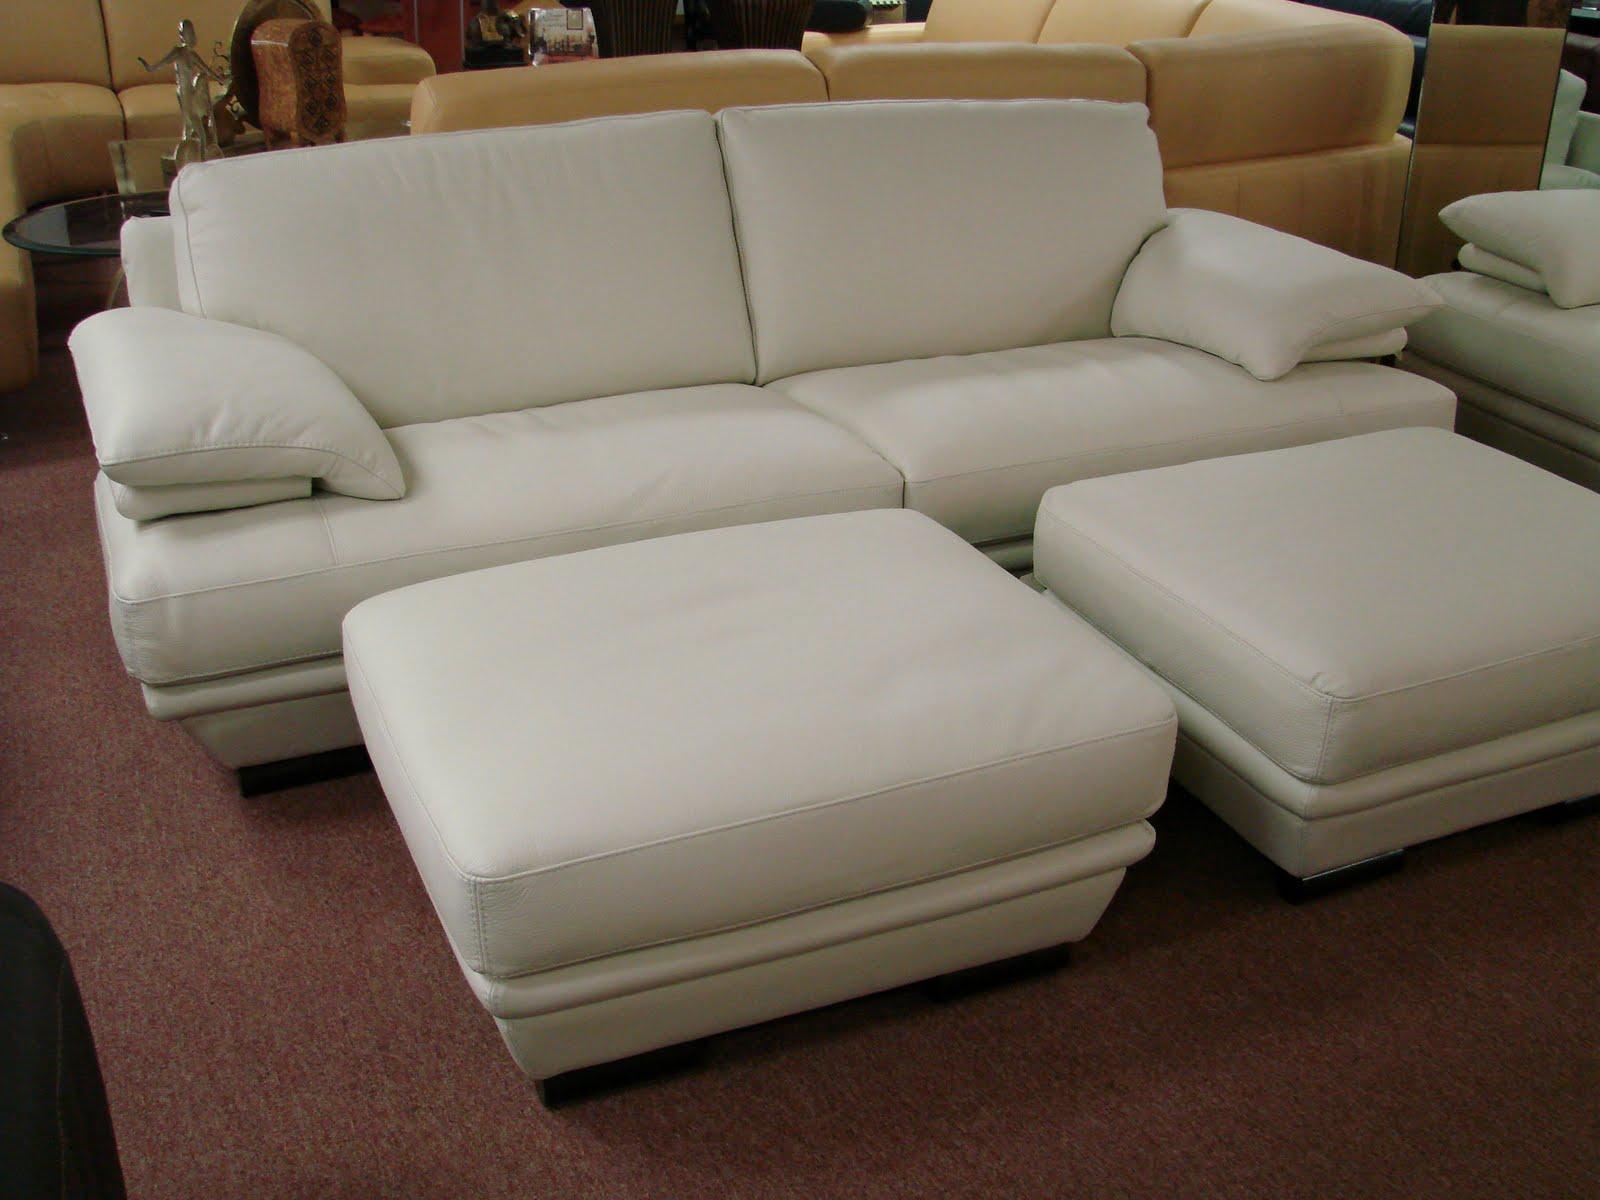 Natuzzi Velvet Sofa Italsofa leather sofa cymun designs Natuzzi